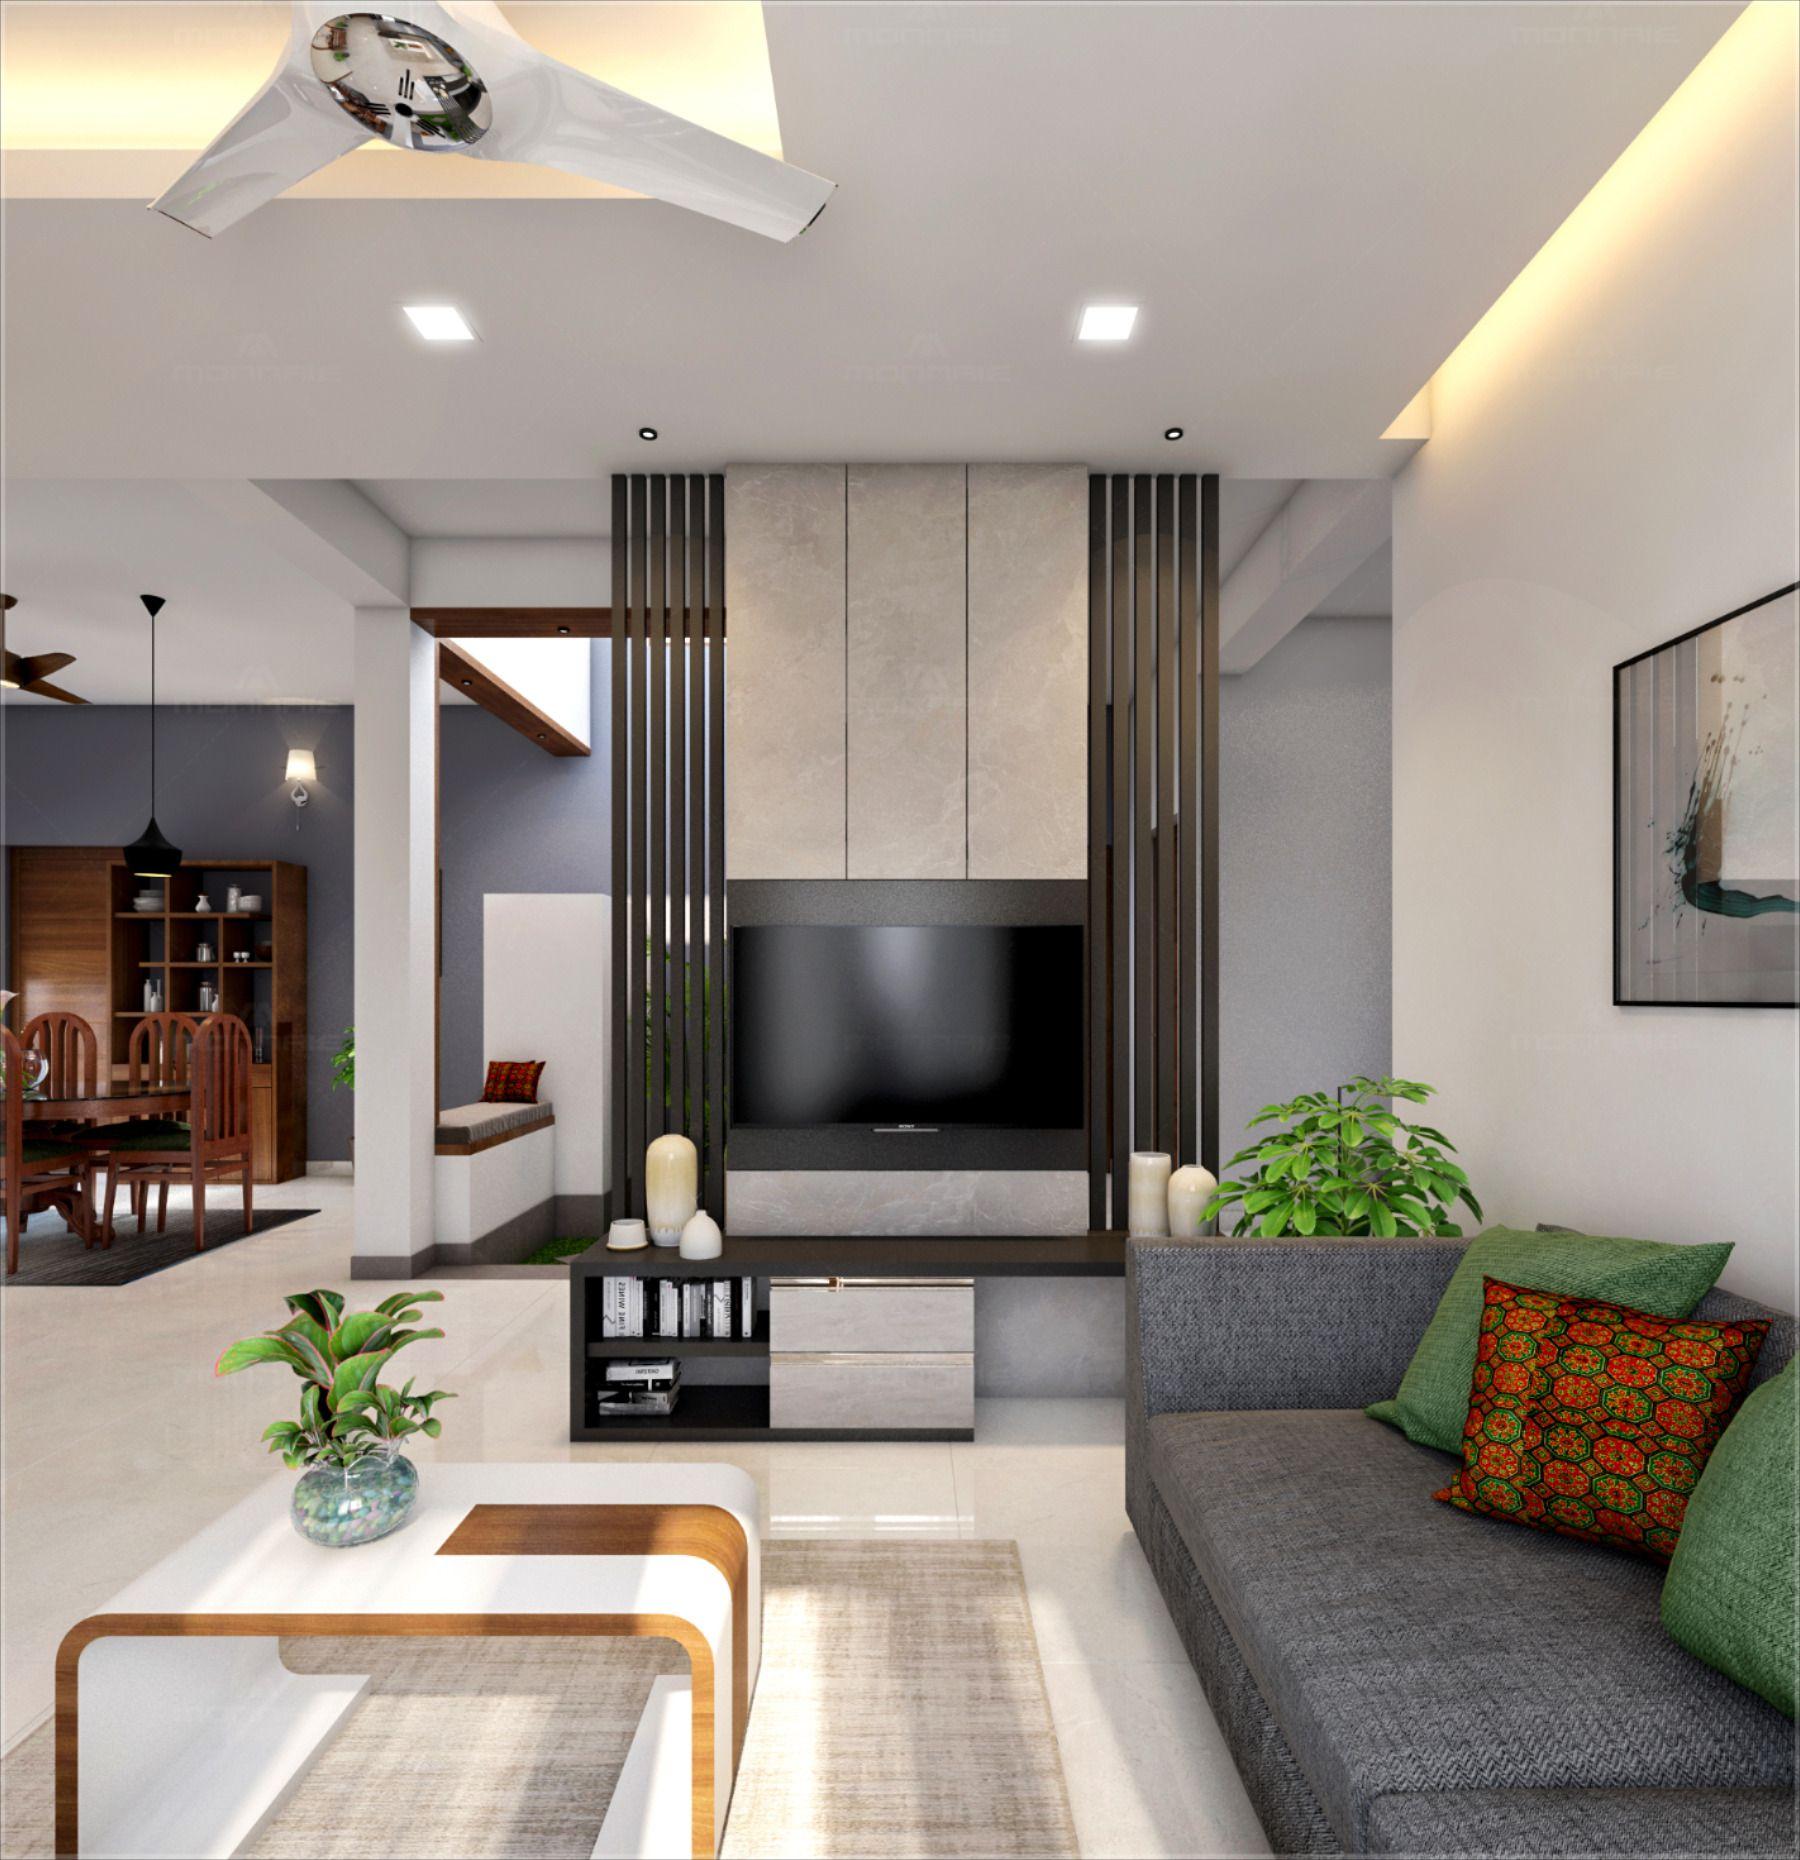 Common Area Design Living Room Designs Living Room Interior Room Design Room interior design photos